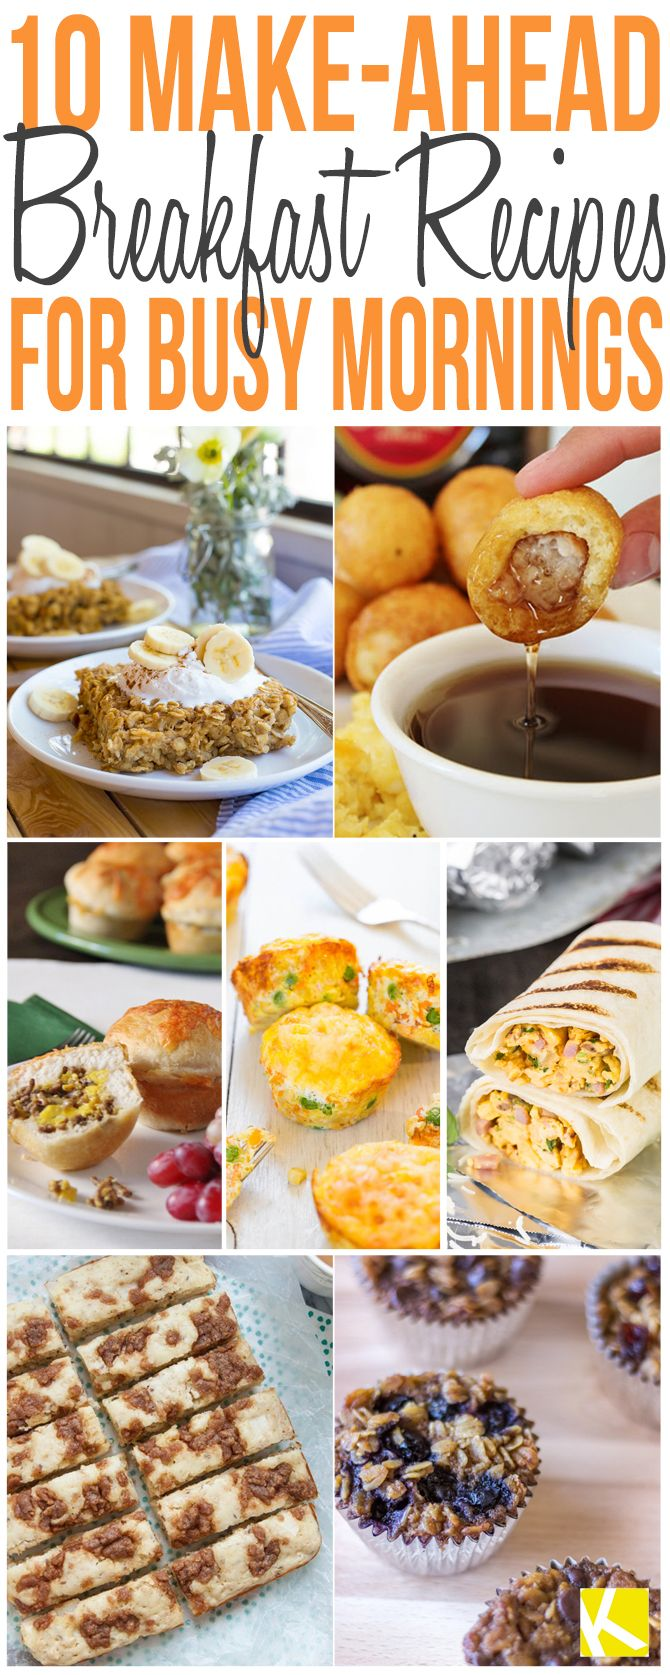 10 Quick and Easy Make-Ahead Breakfast Recipes (Make Ahead Breakfast)